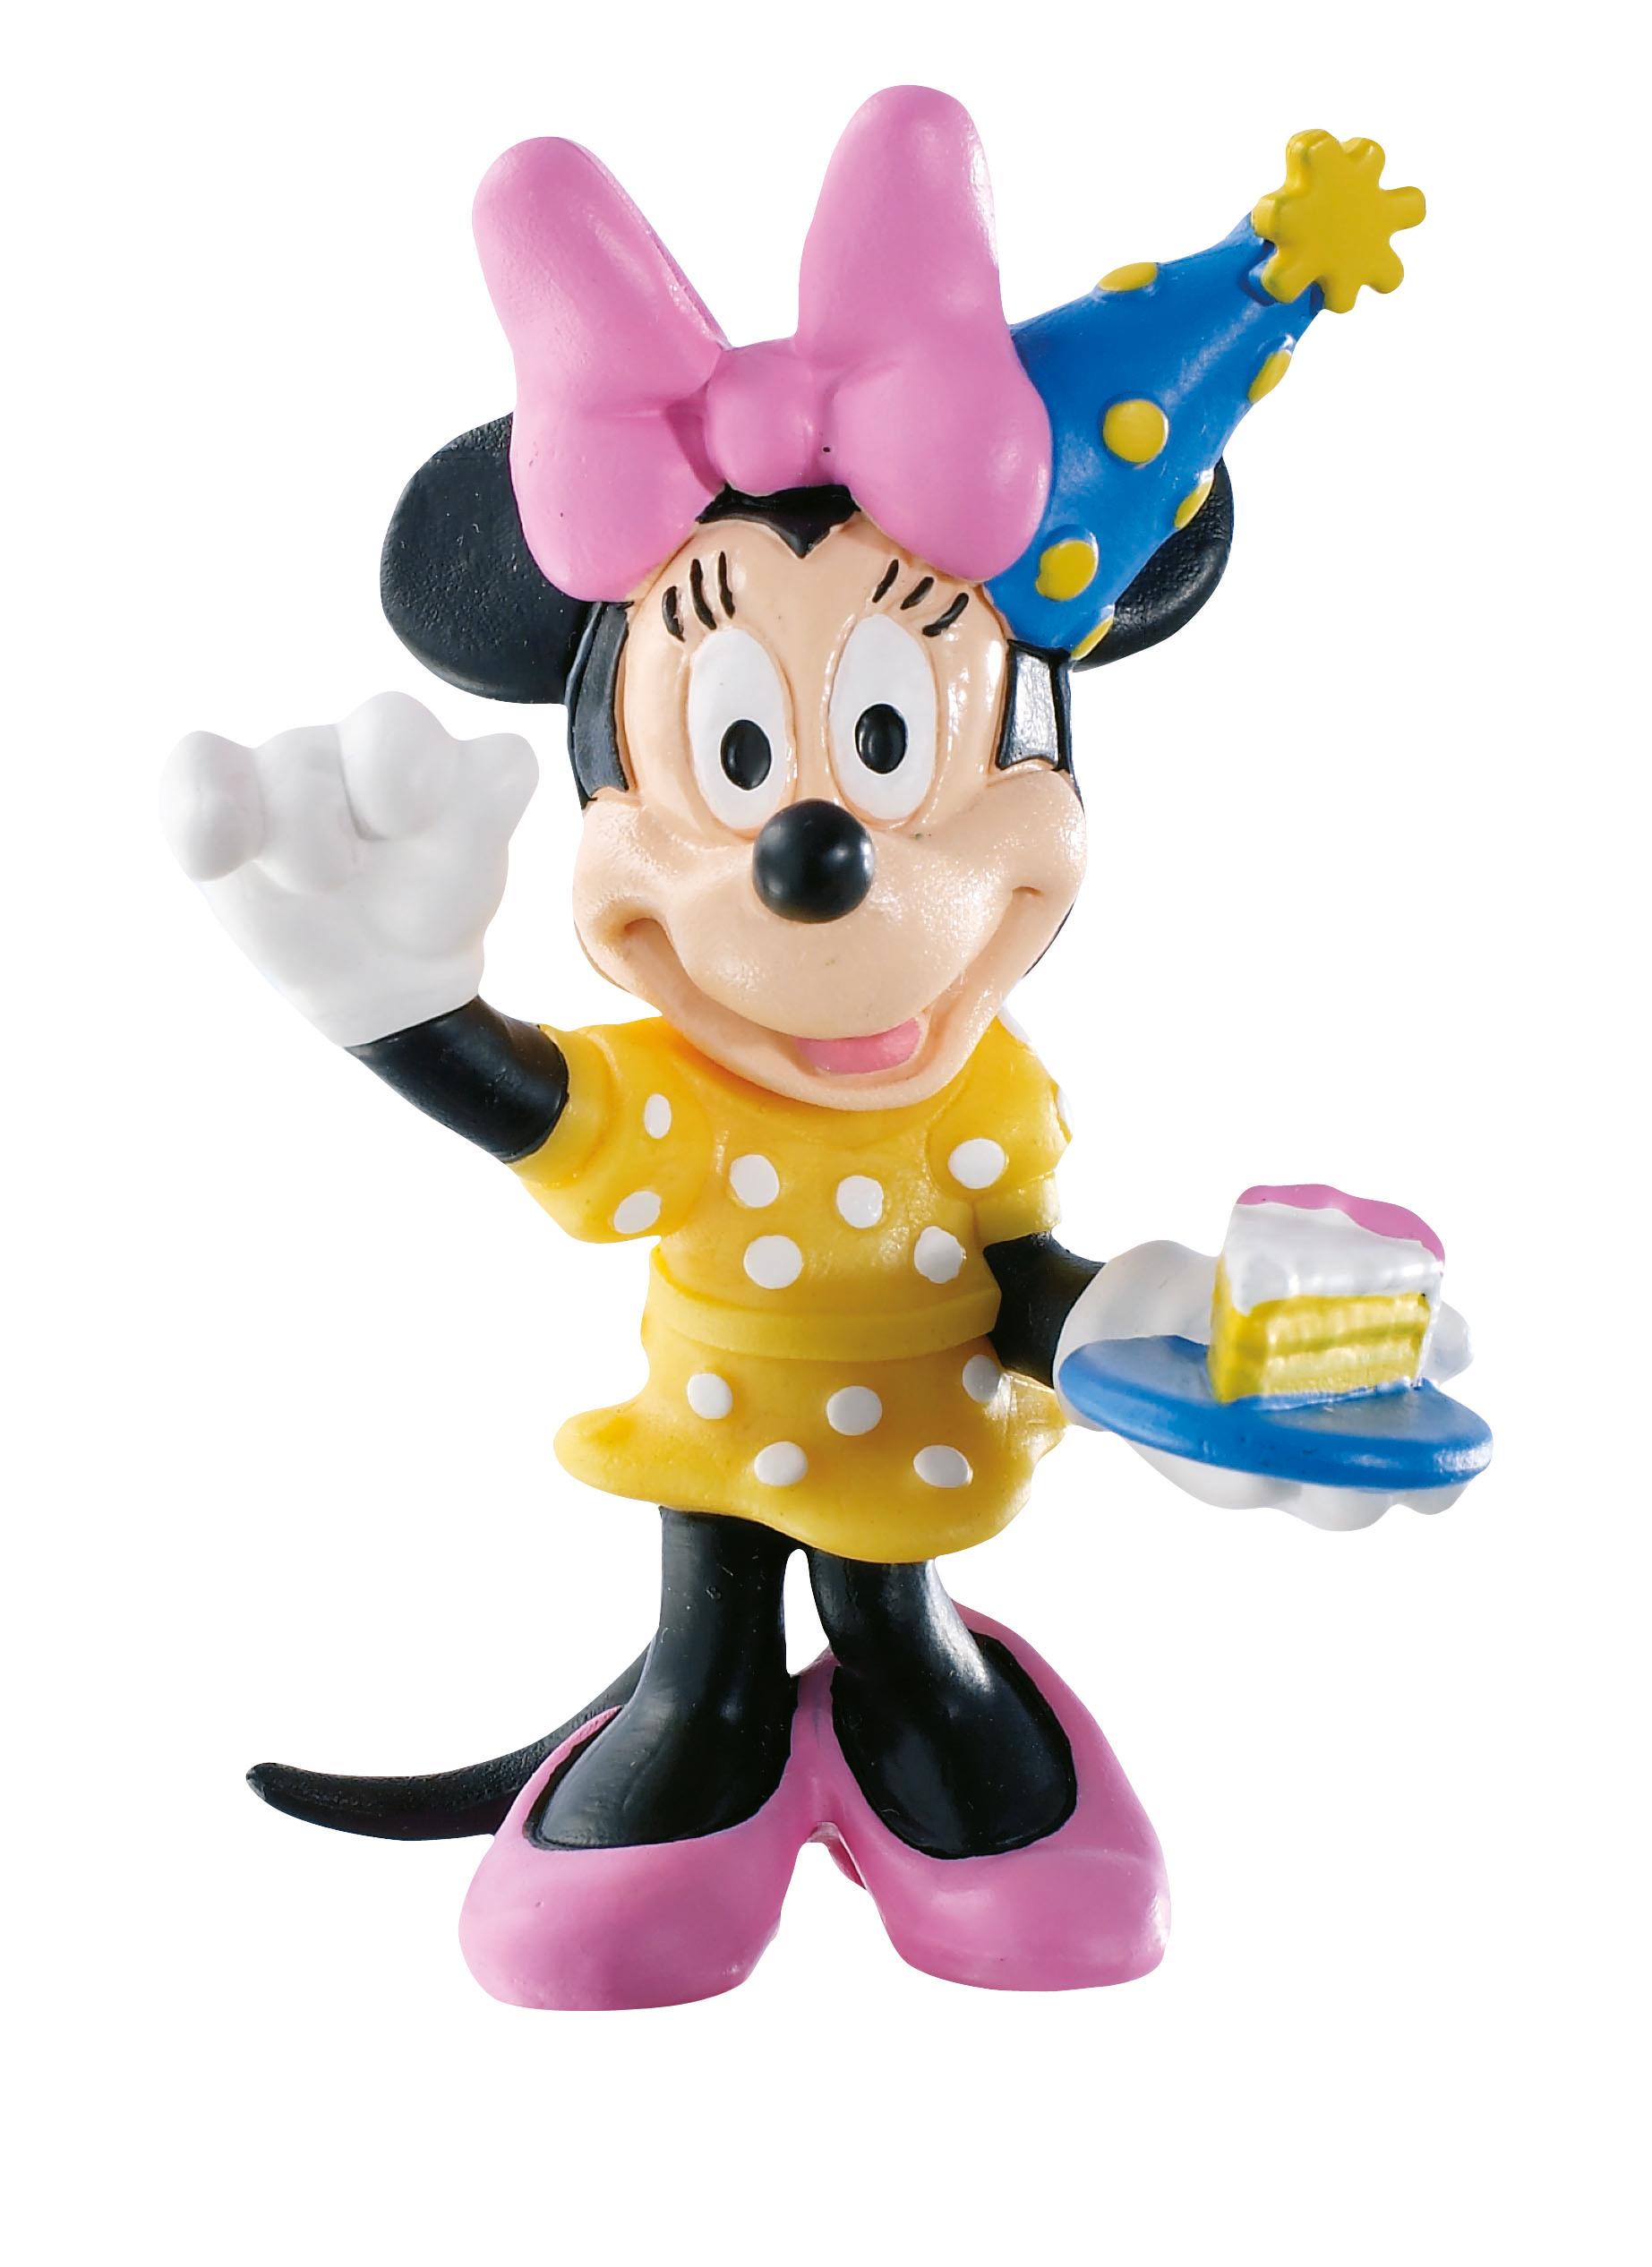 Figurine La Maison de Mickey Disney - Minnie anniversaire - 8 cm